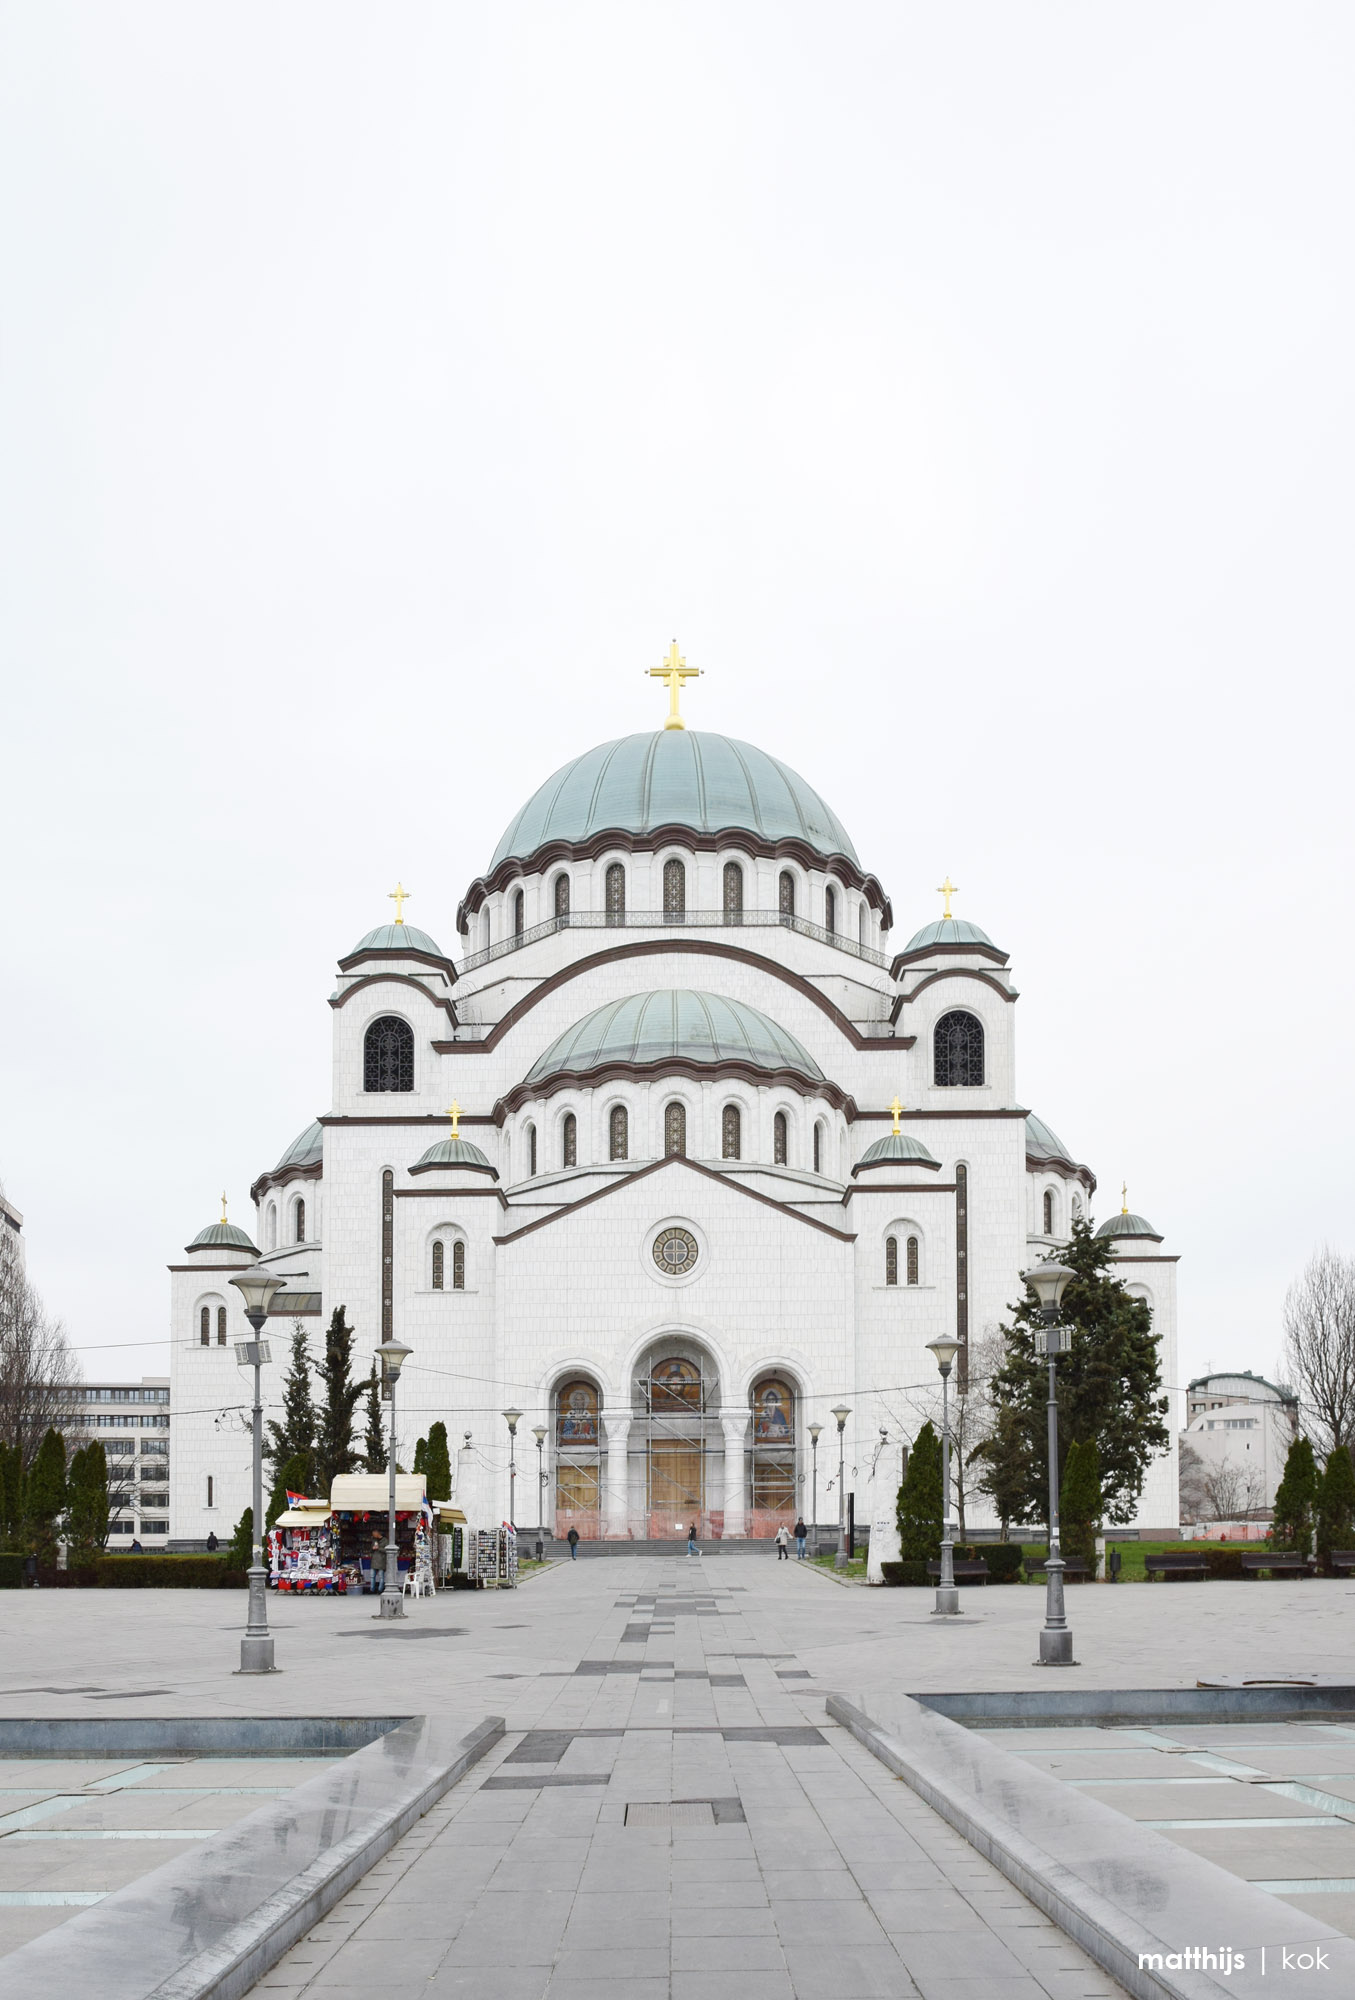 St. Sava Temple, Belgrade, Serbia   Photo by Matthijs Kok